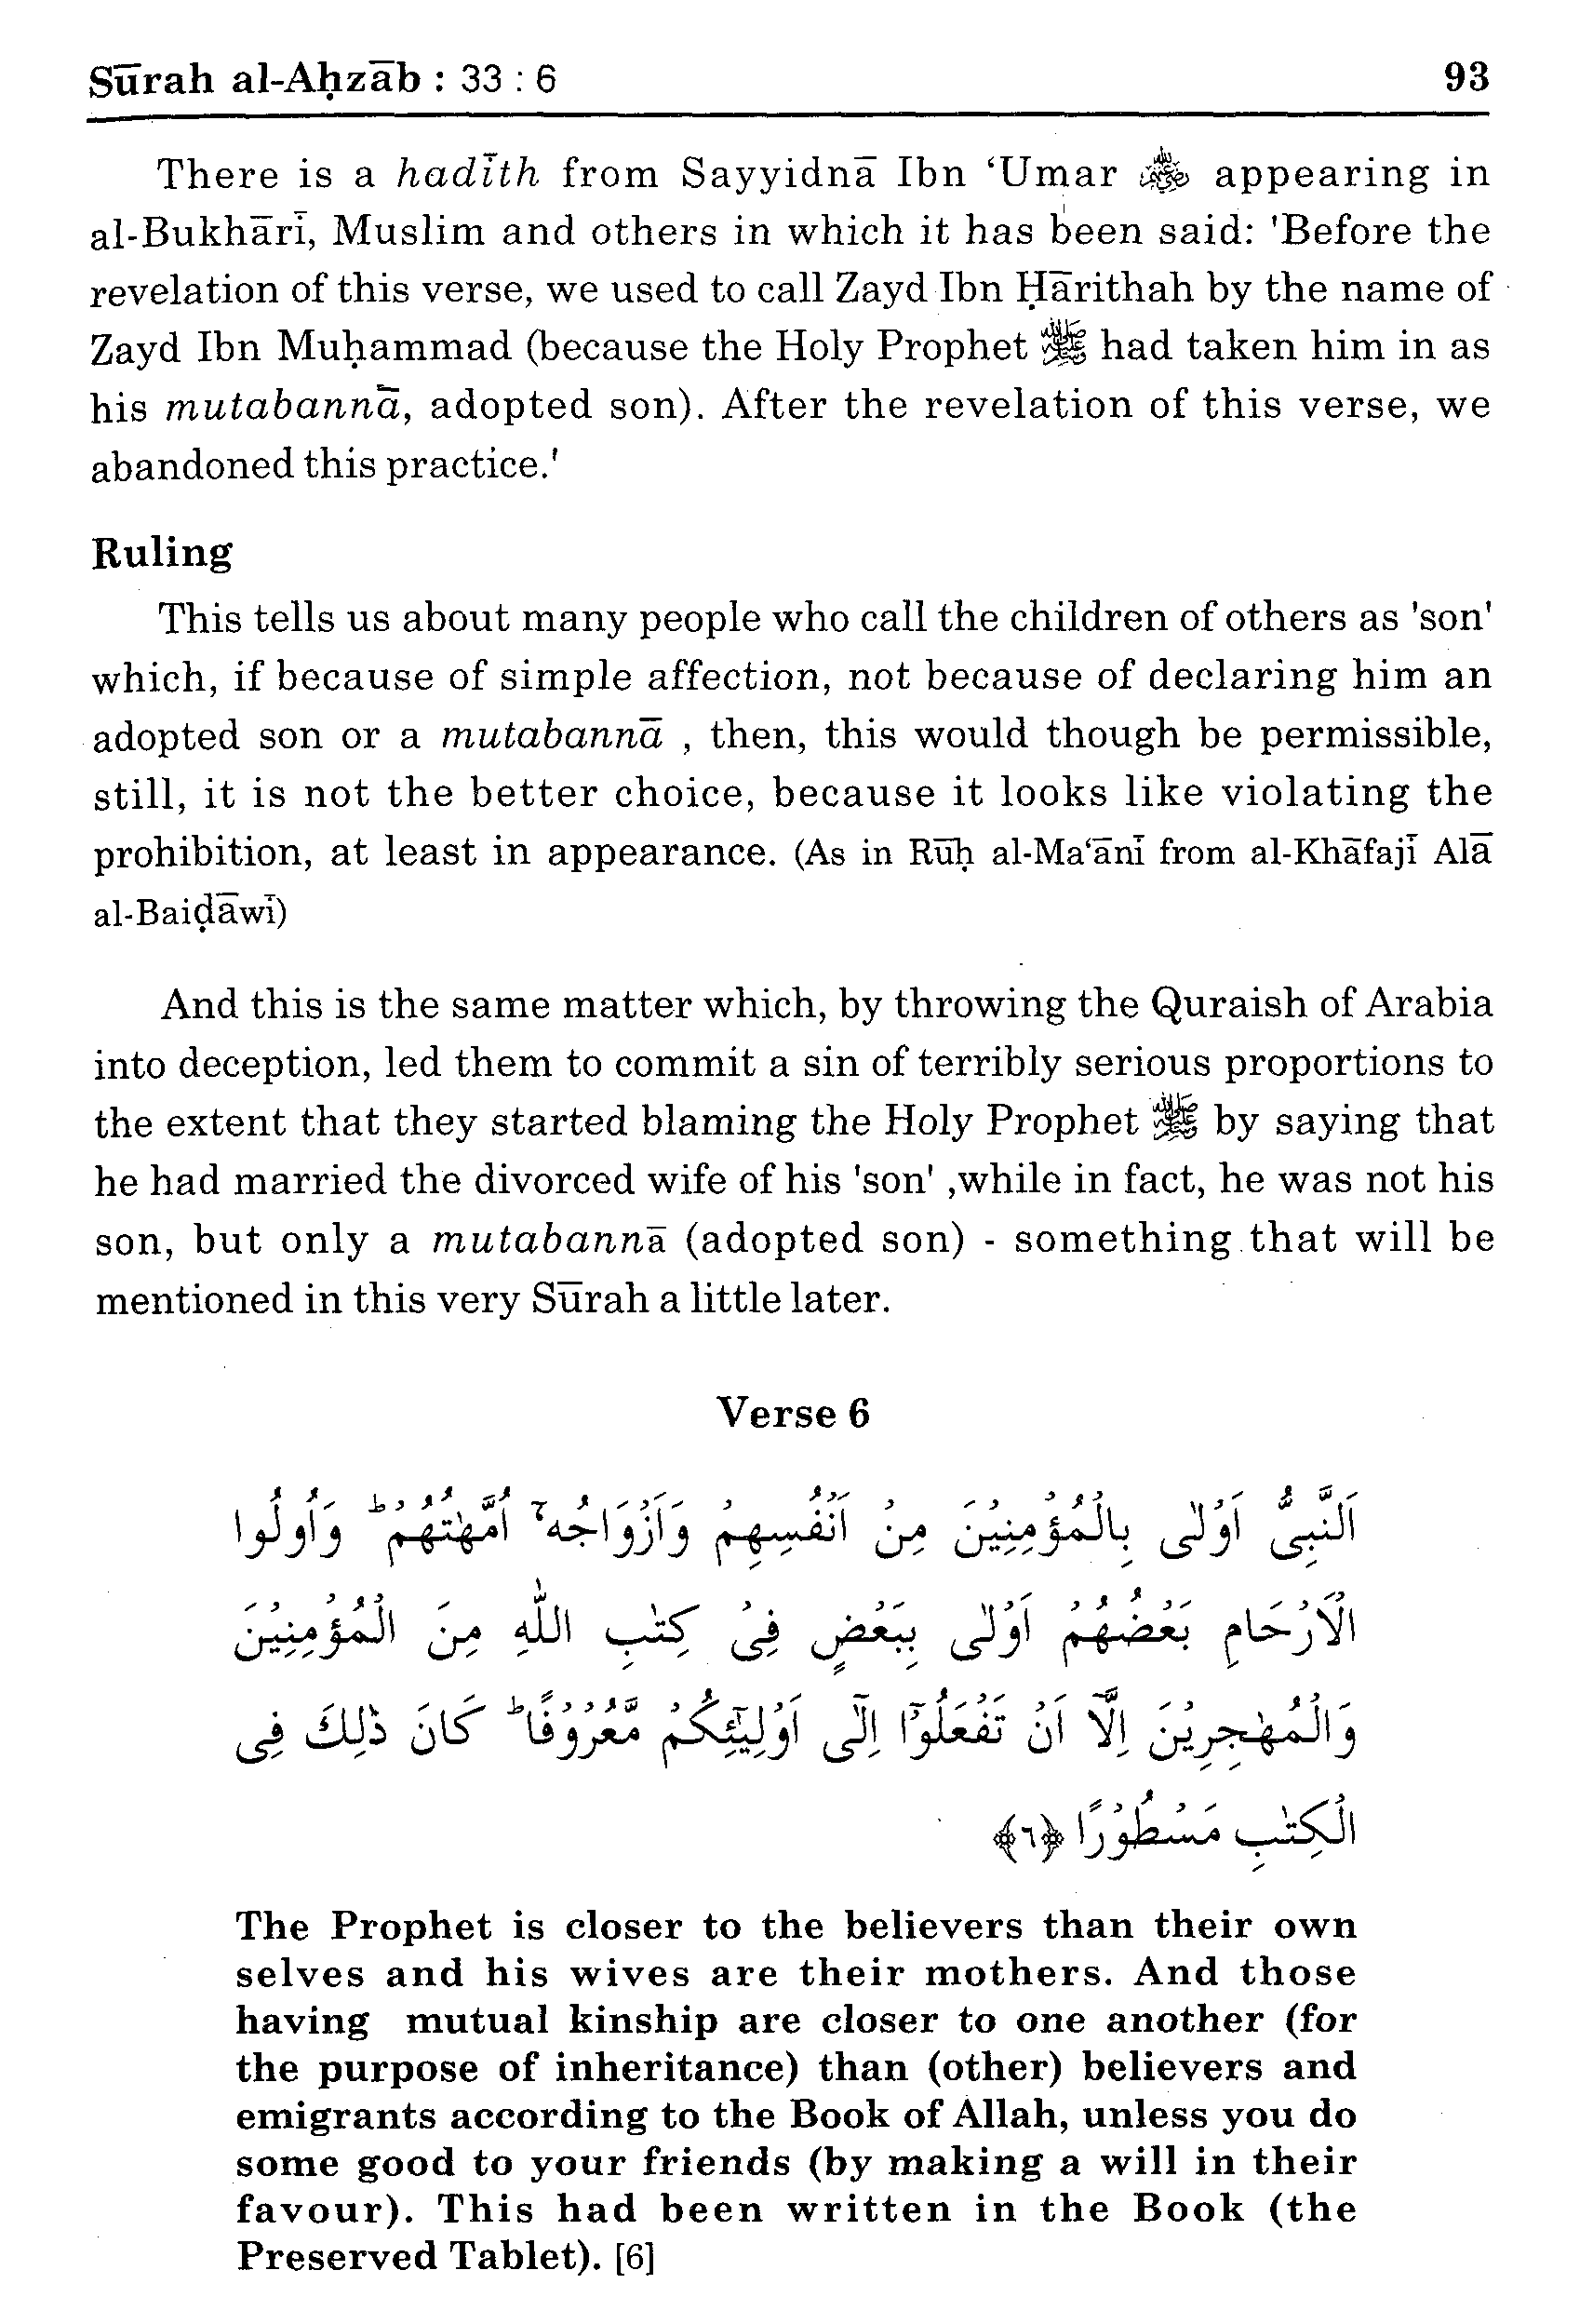 Surah Al-Ahzab 33:6-6 - Maariful Quran - Maarif ul Quran